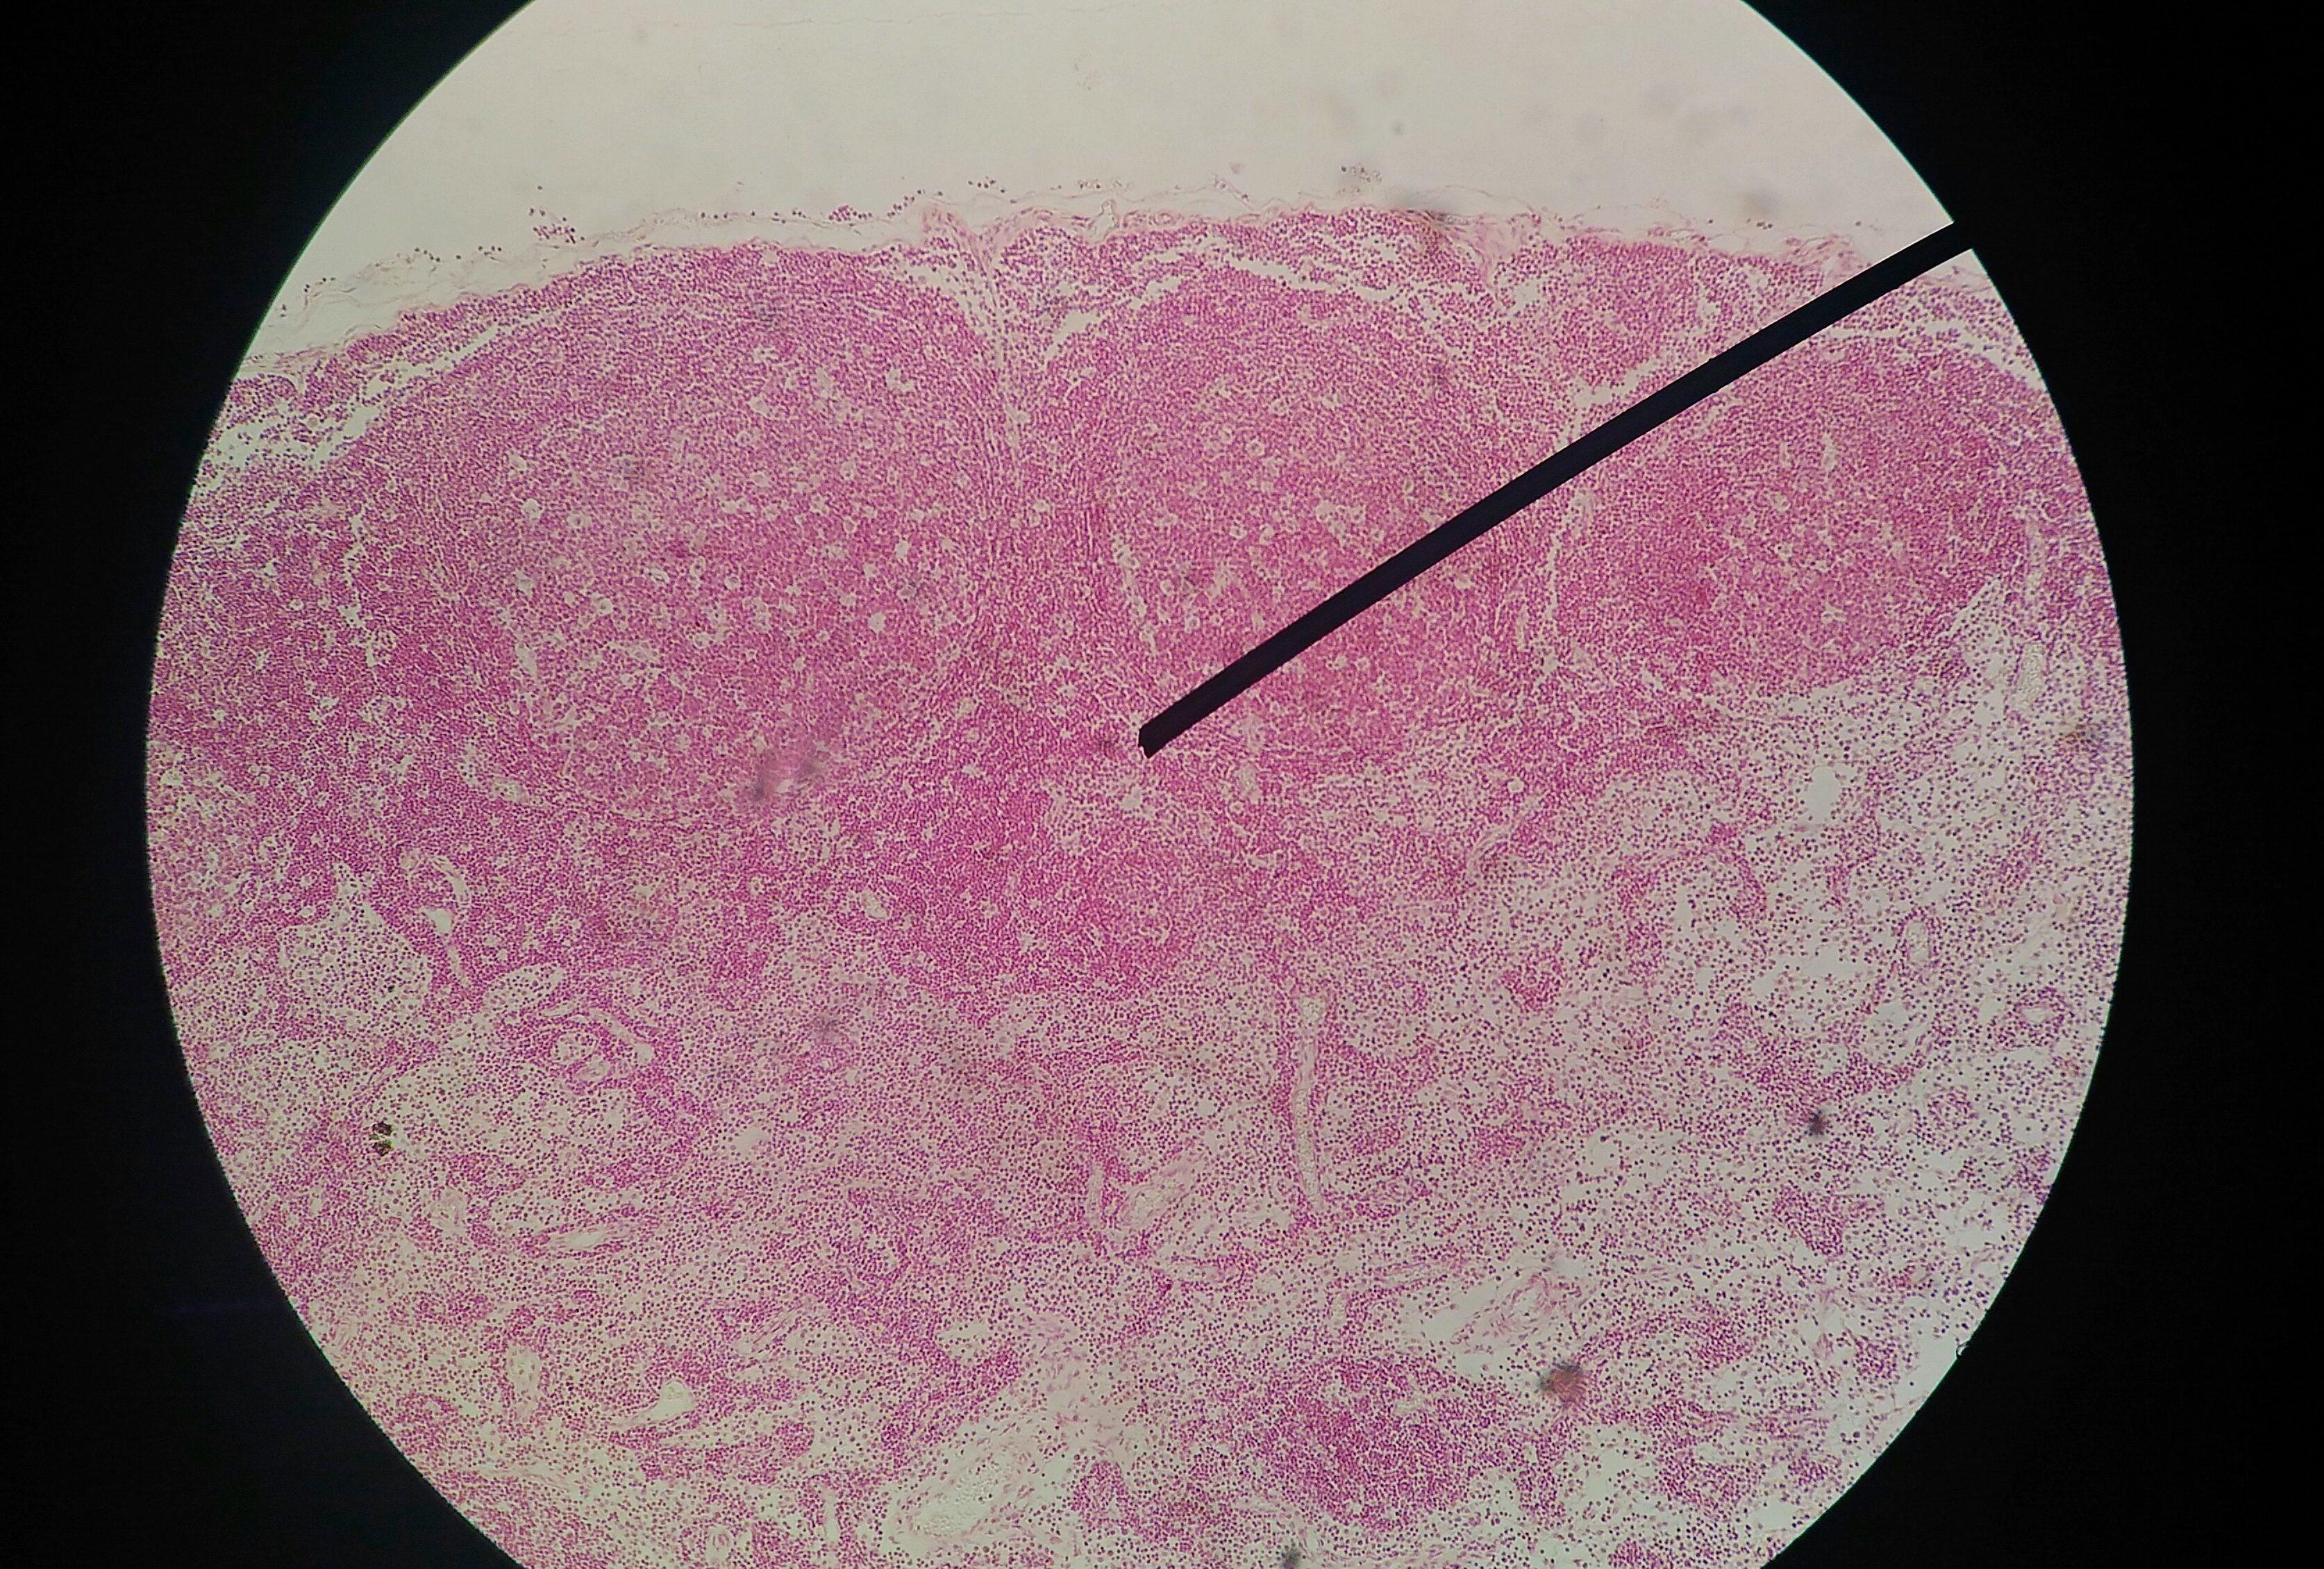 papillomavirus genital herpes